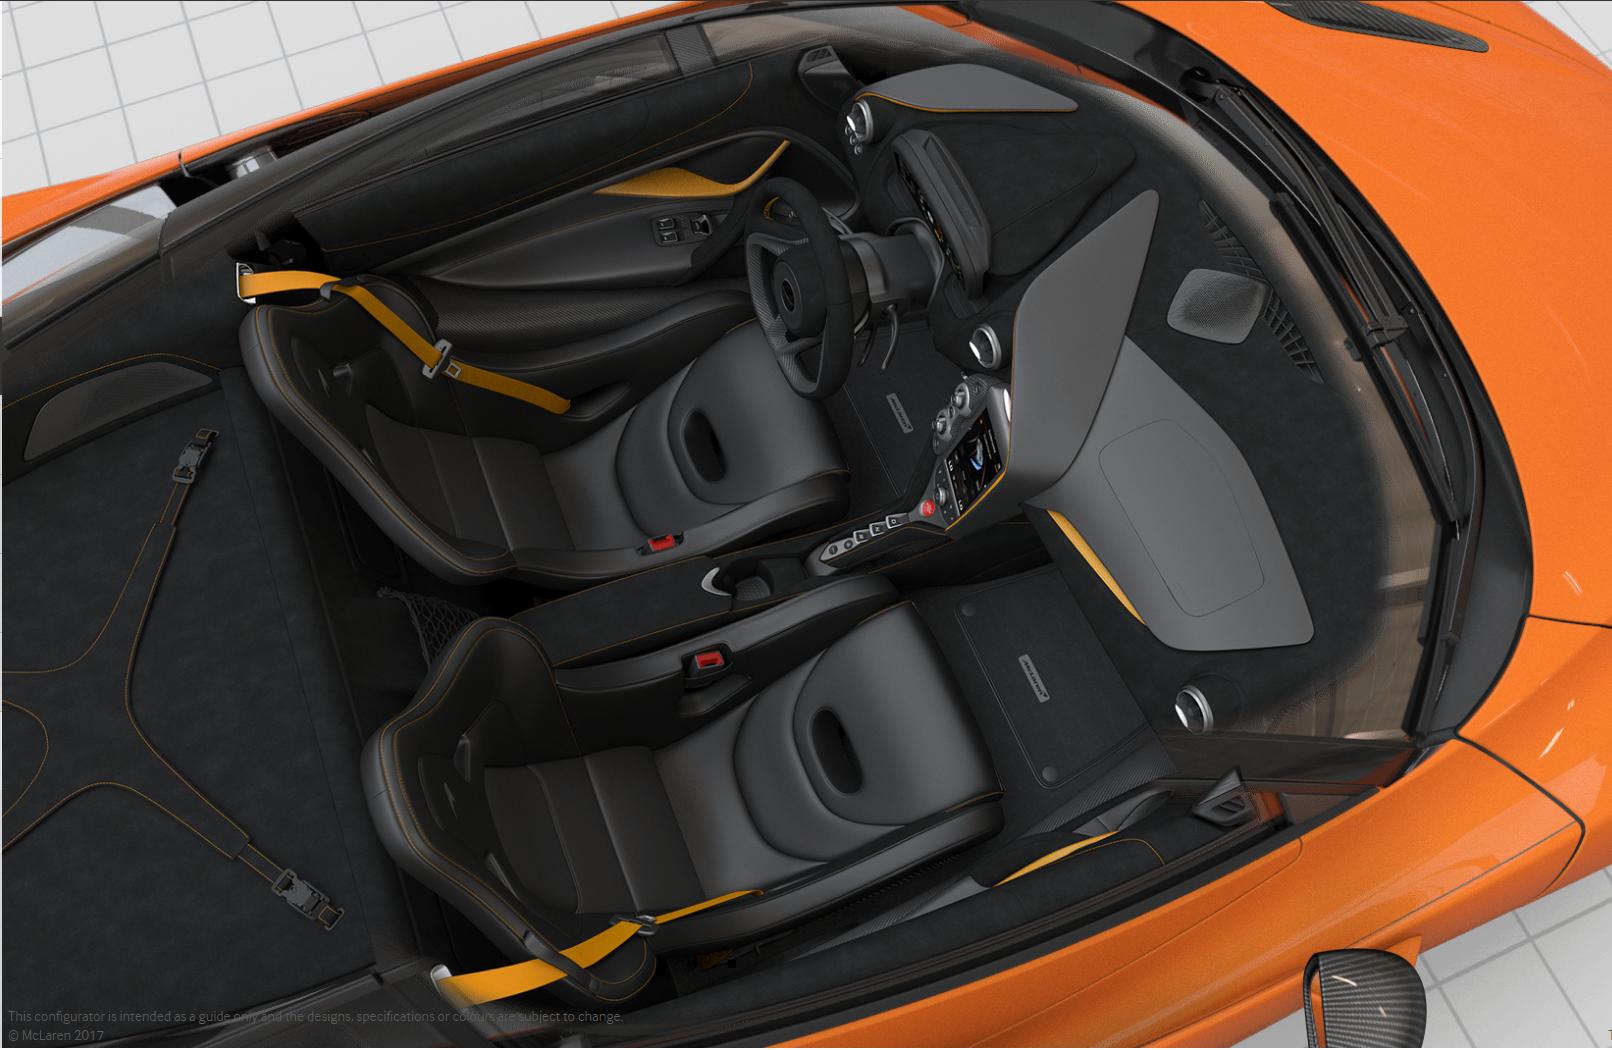 Image Result For Honda Exterior Colorsa